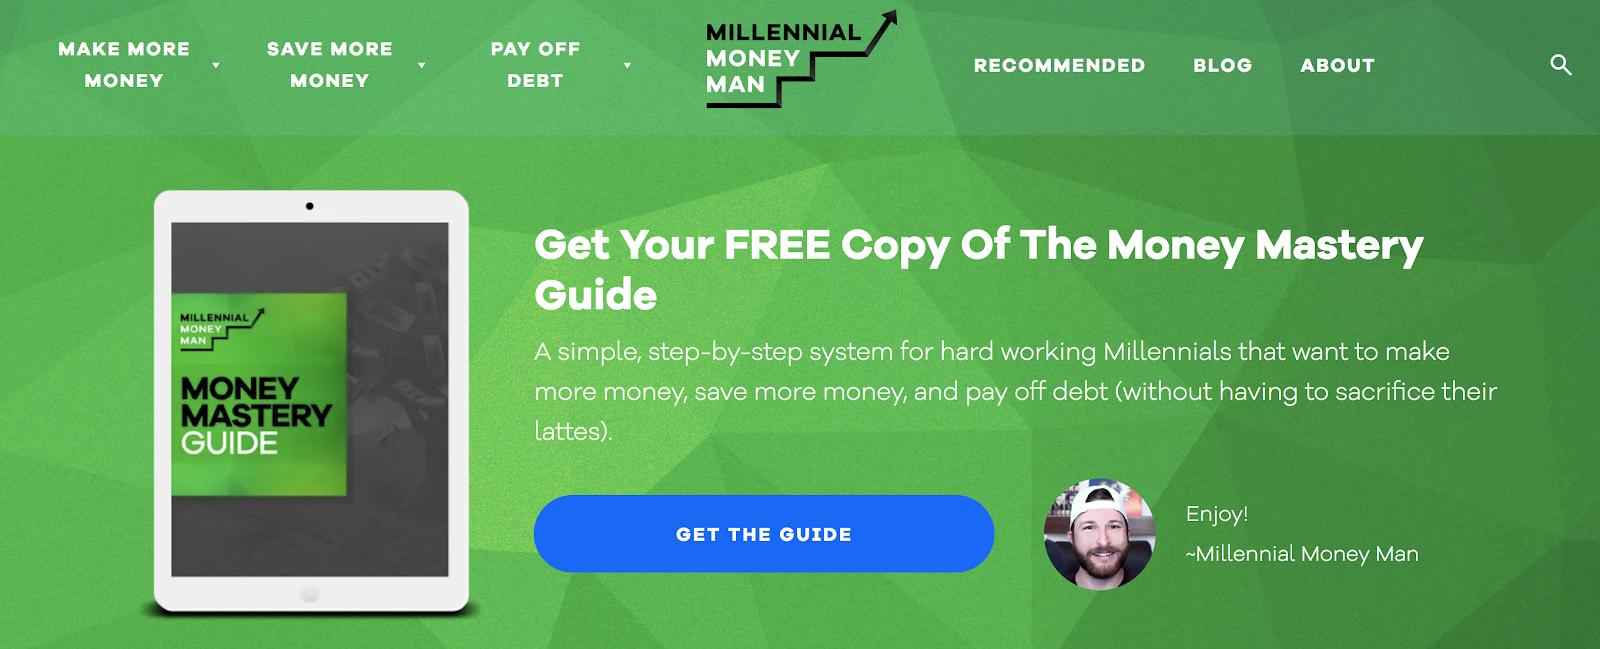 Mistakes to Avoid When Blogging (Millennial Money Man Example) Screenshot